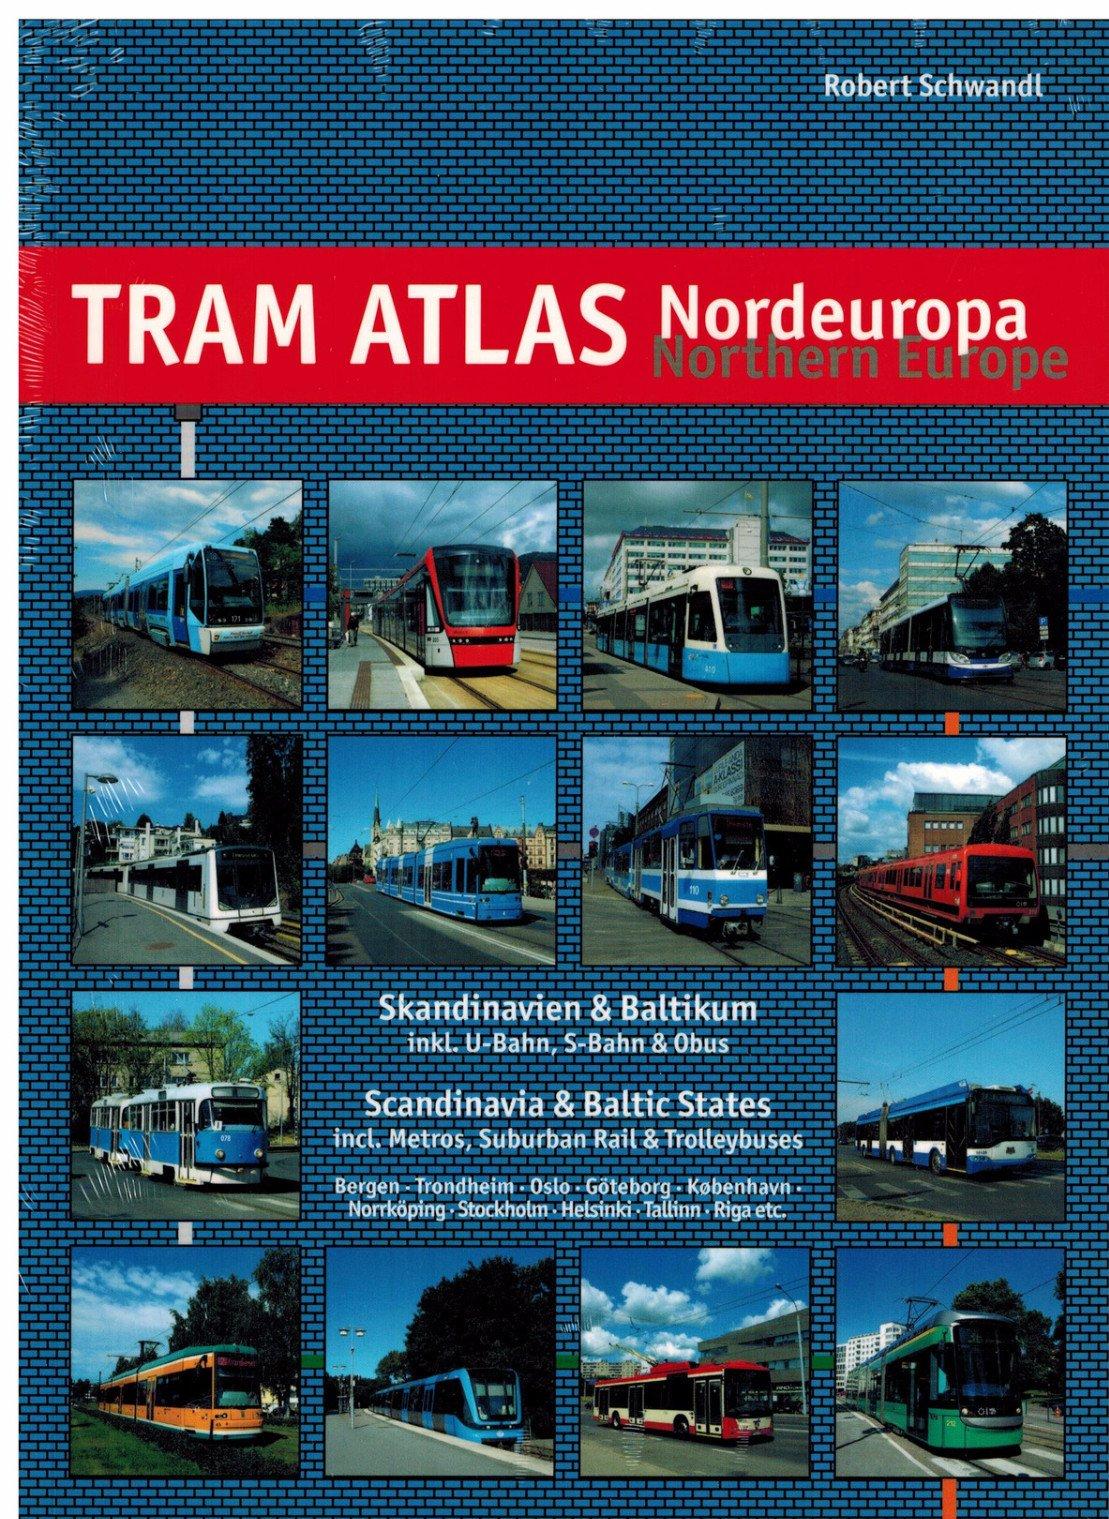 Tram Atlas Nordeuropa